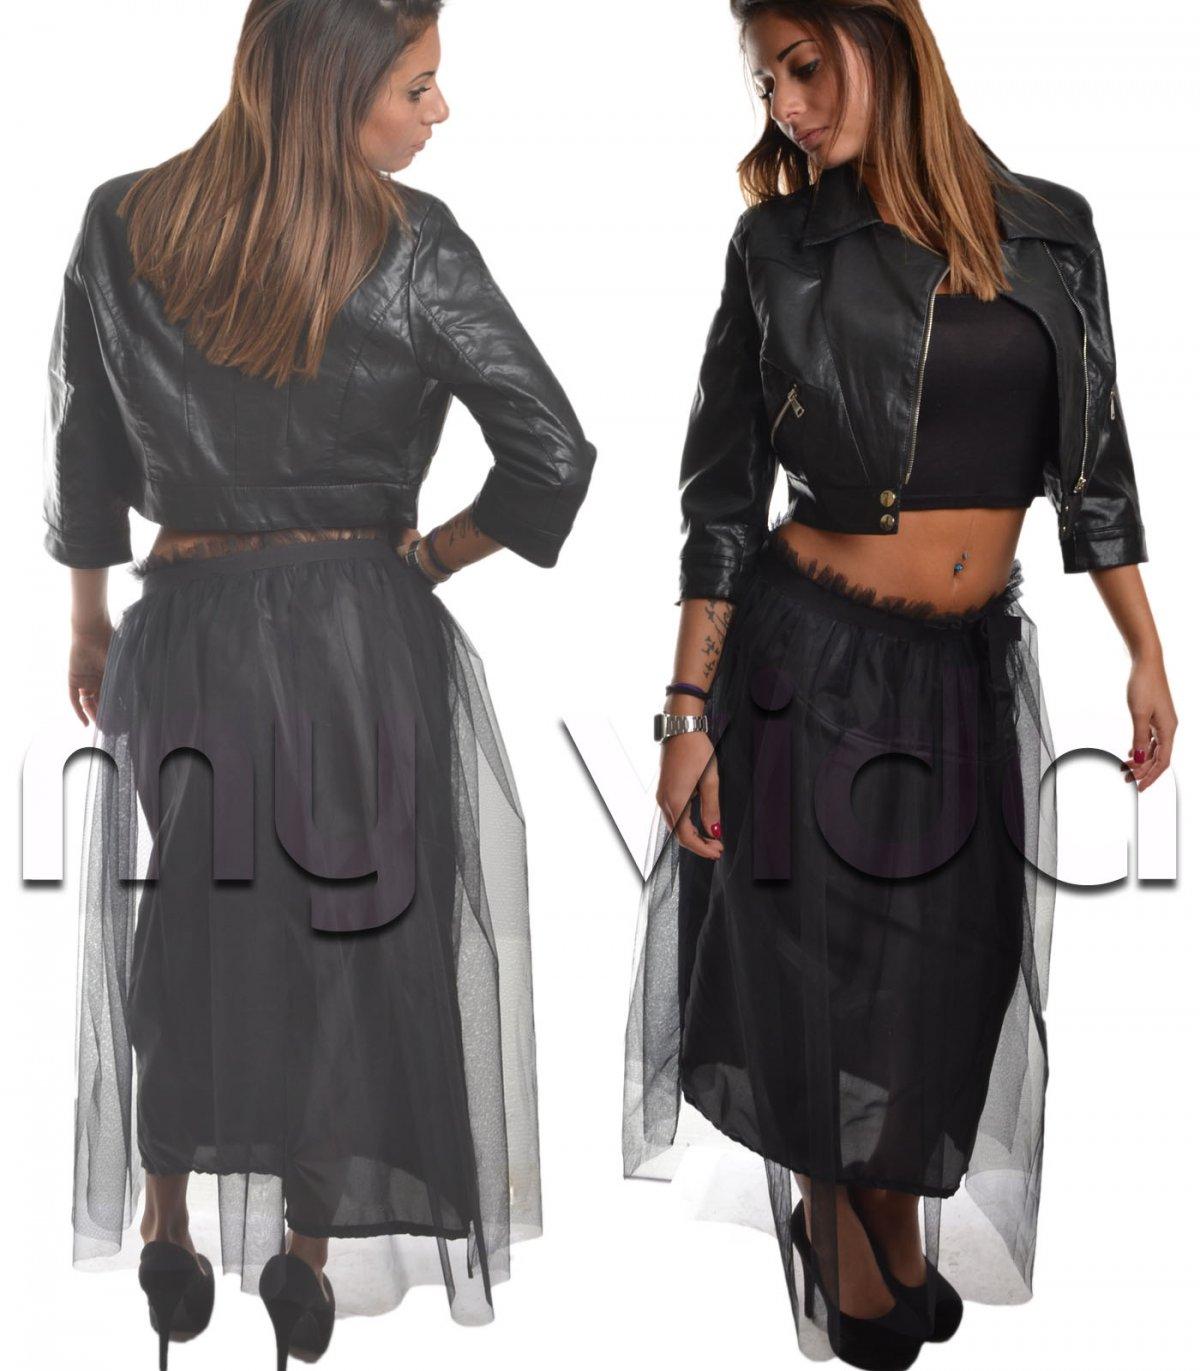 huge discount e0563 84634 Gonna tulle donna Rock skirt moda | My Vida